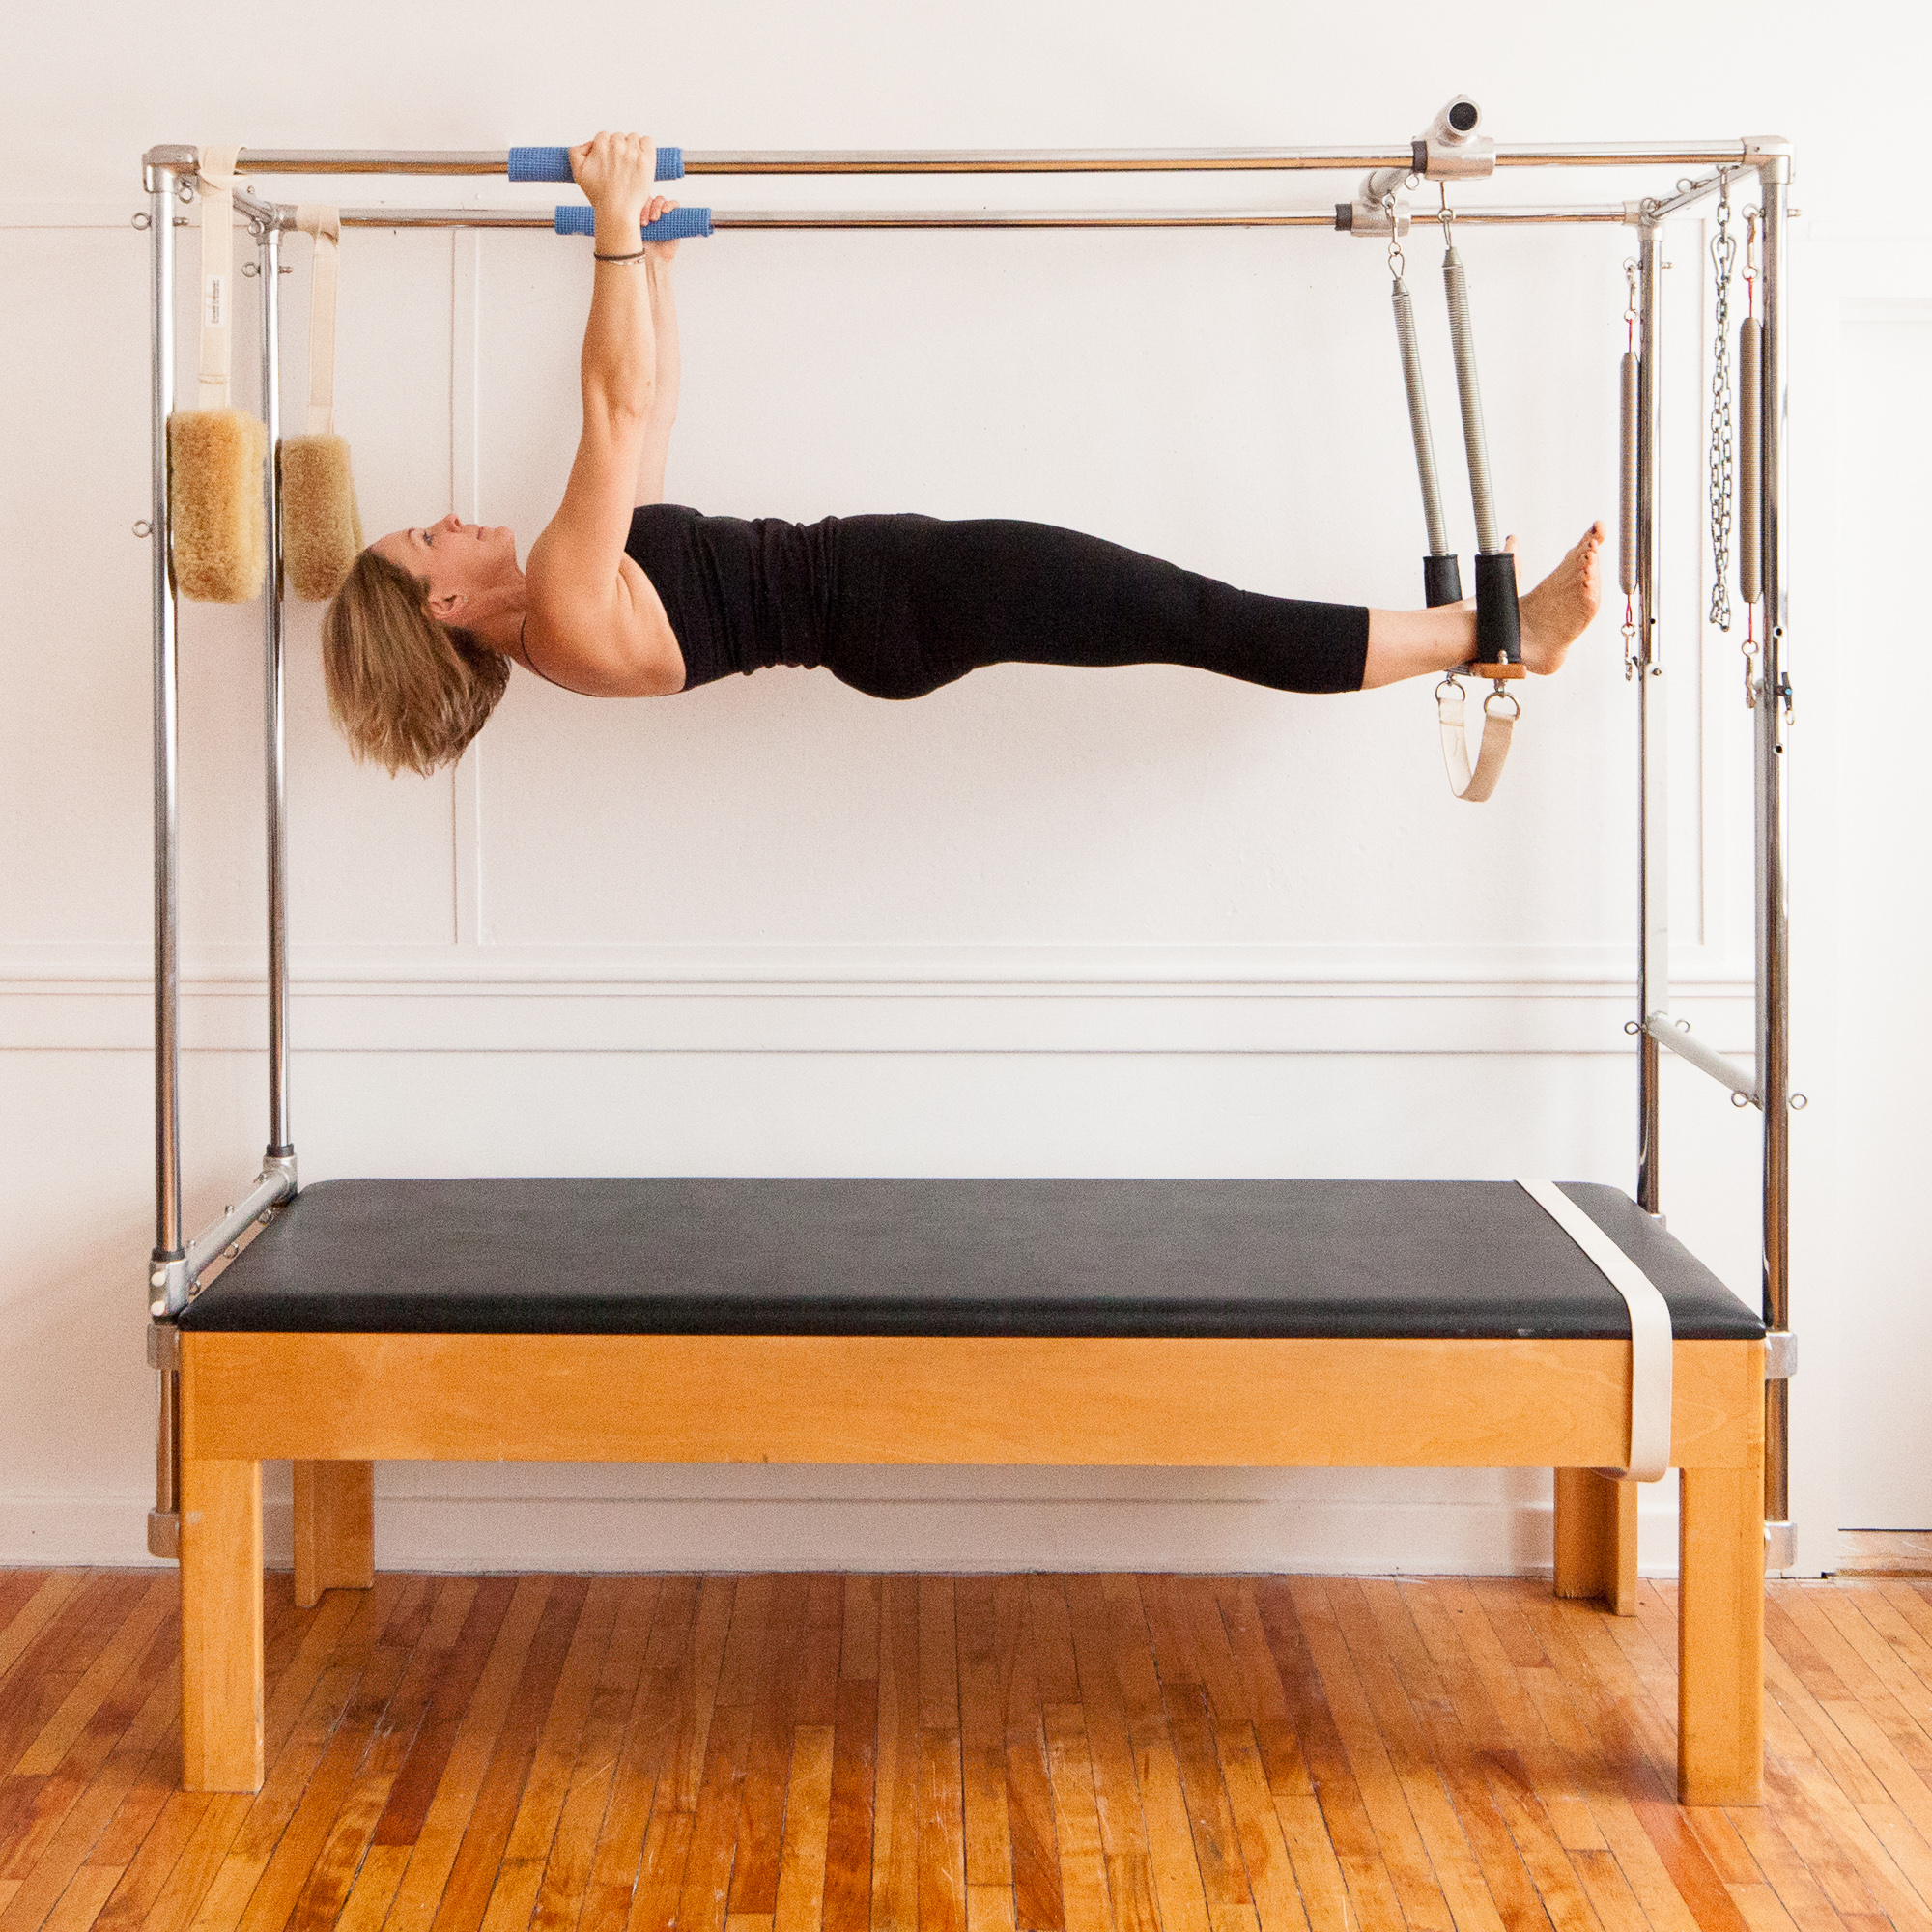 Hanging Pull-Ups - 1